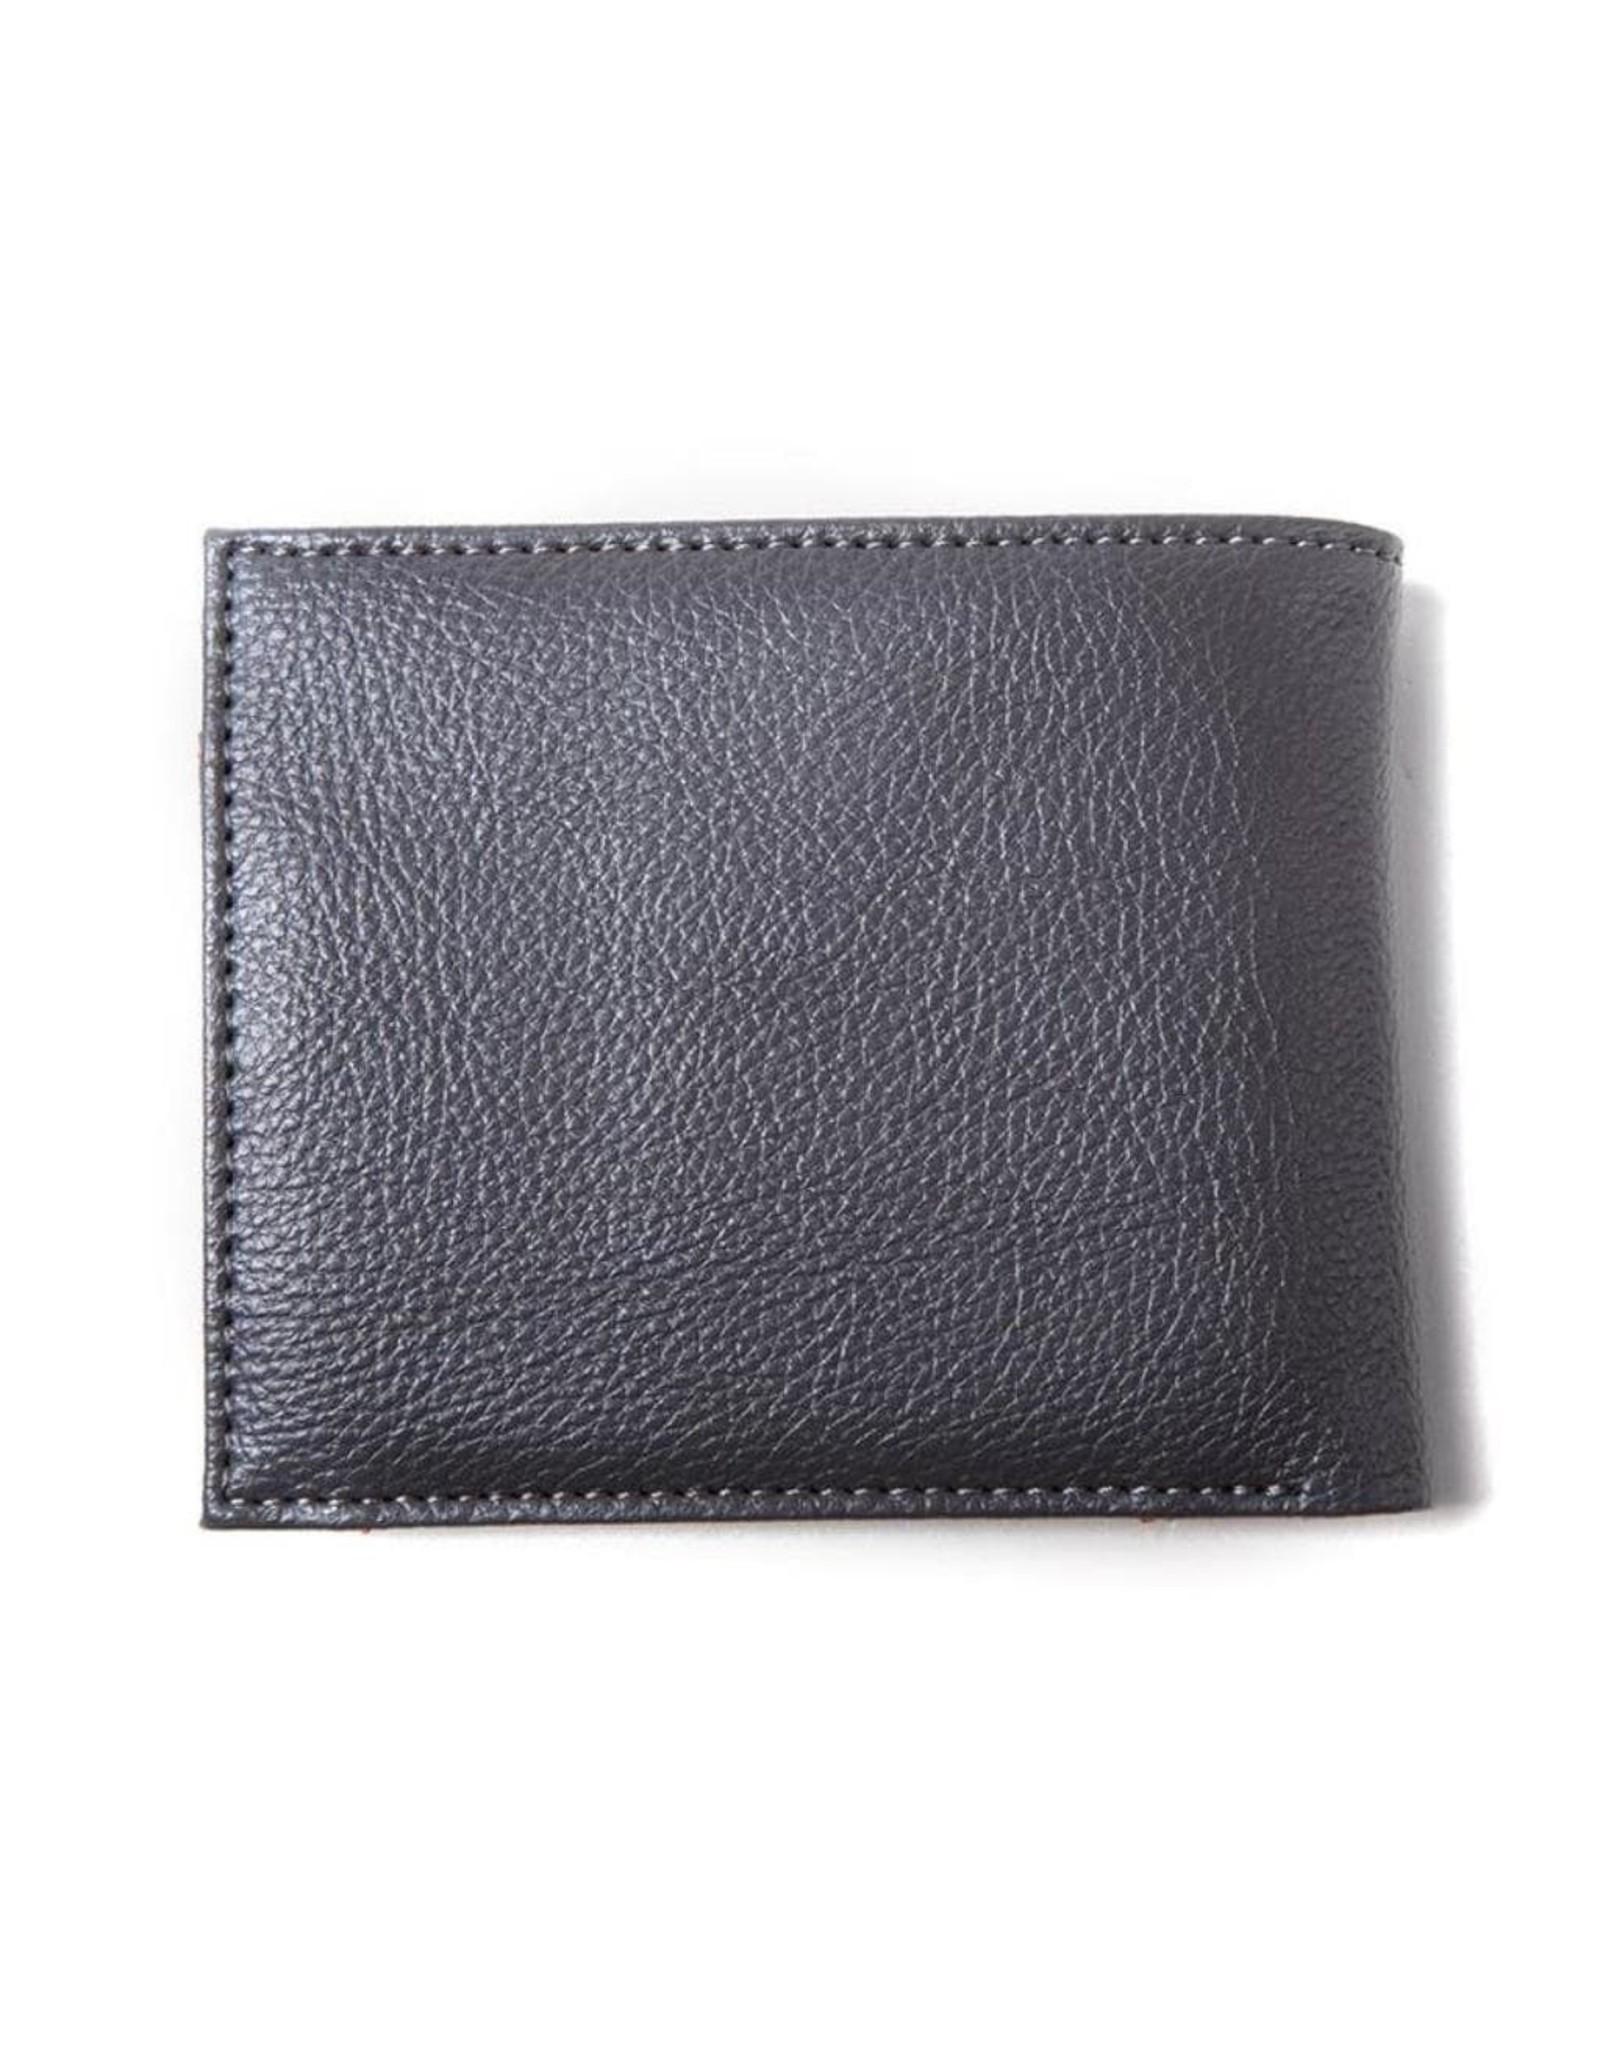 Division2 Merchandise portemonnees - Division 2 SHD portemonnee